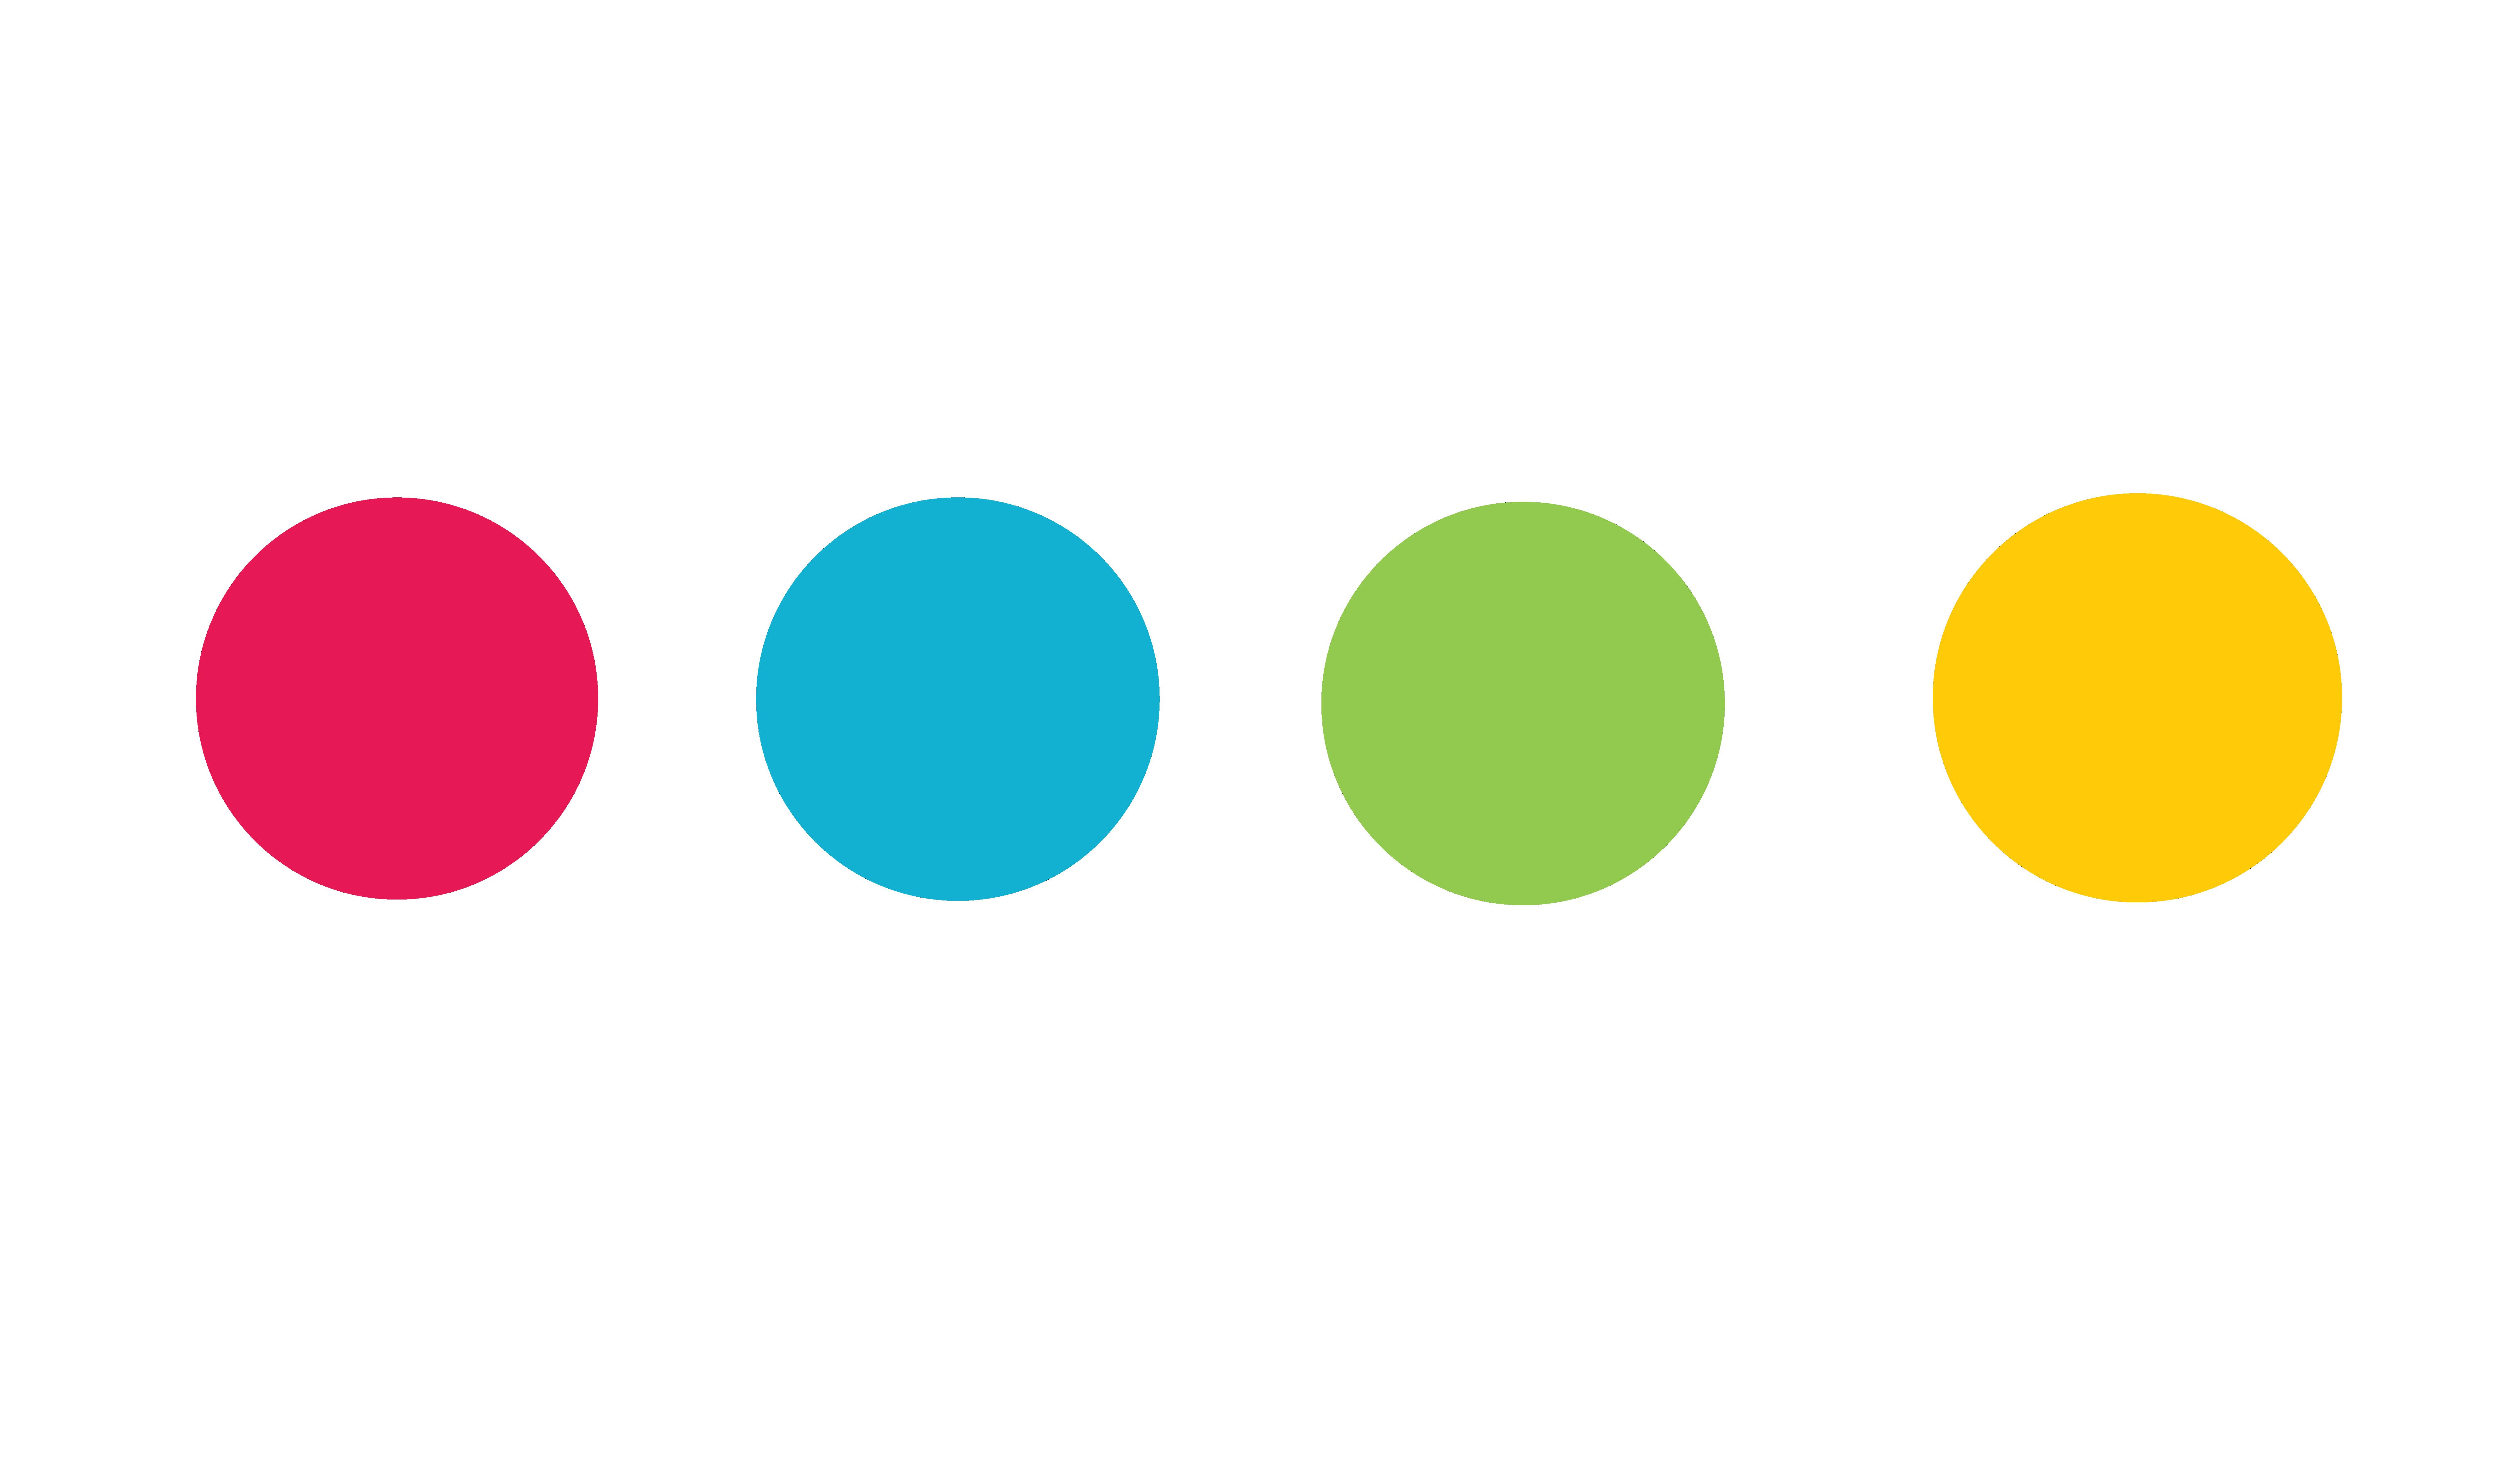 Primer Congreso Binacional de Investigación UNET